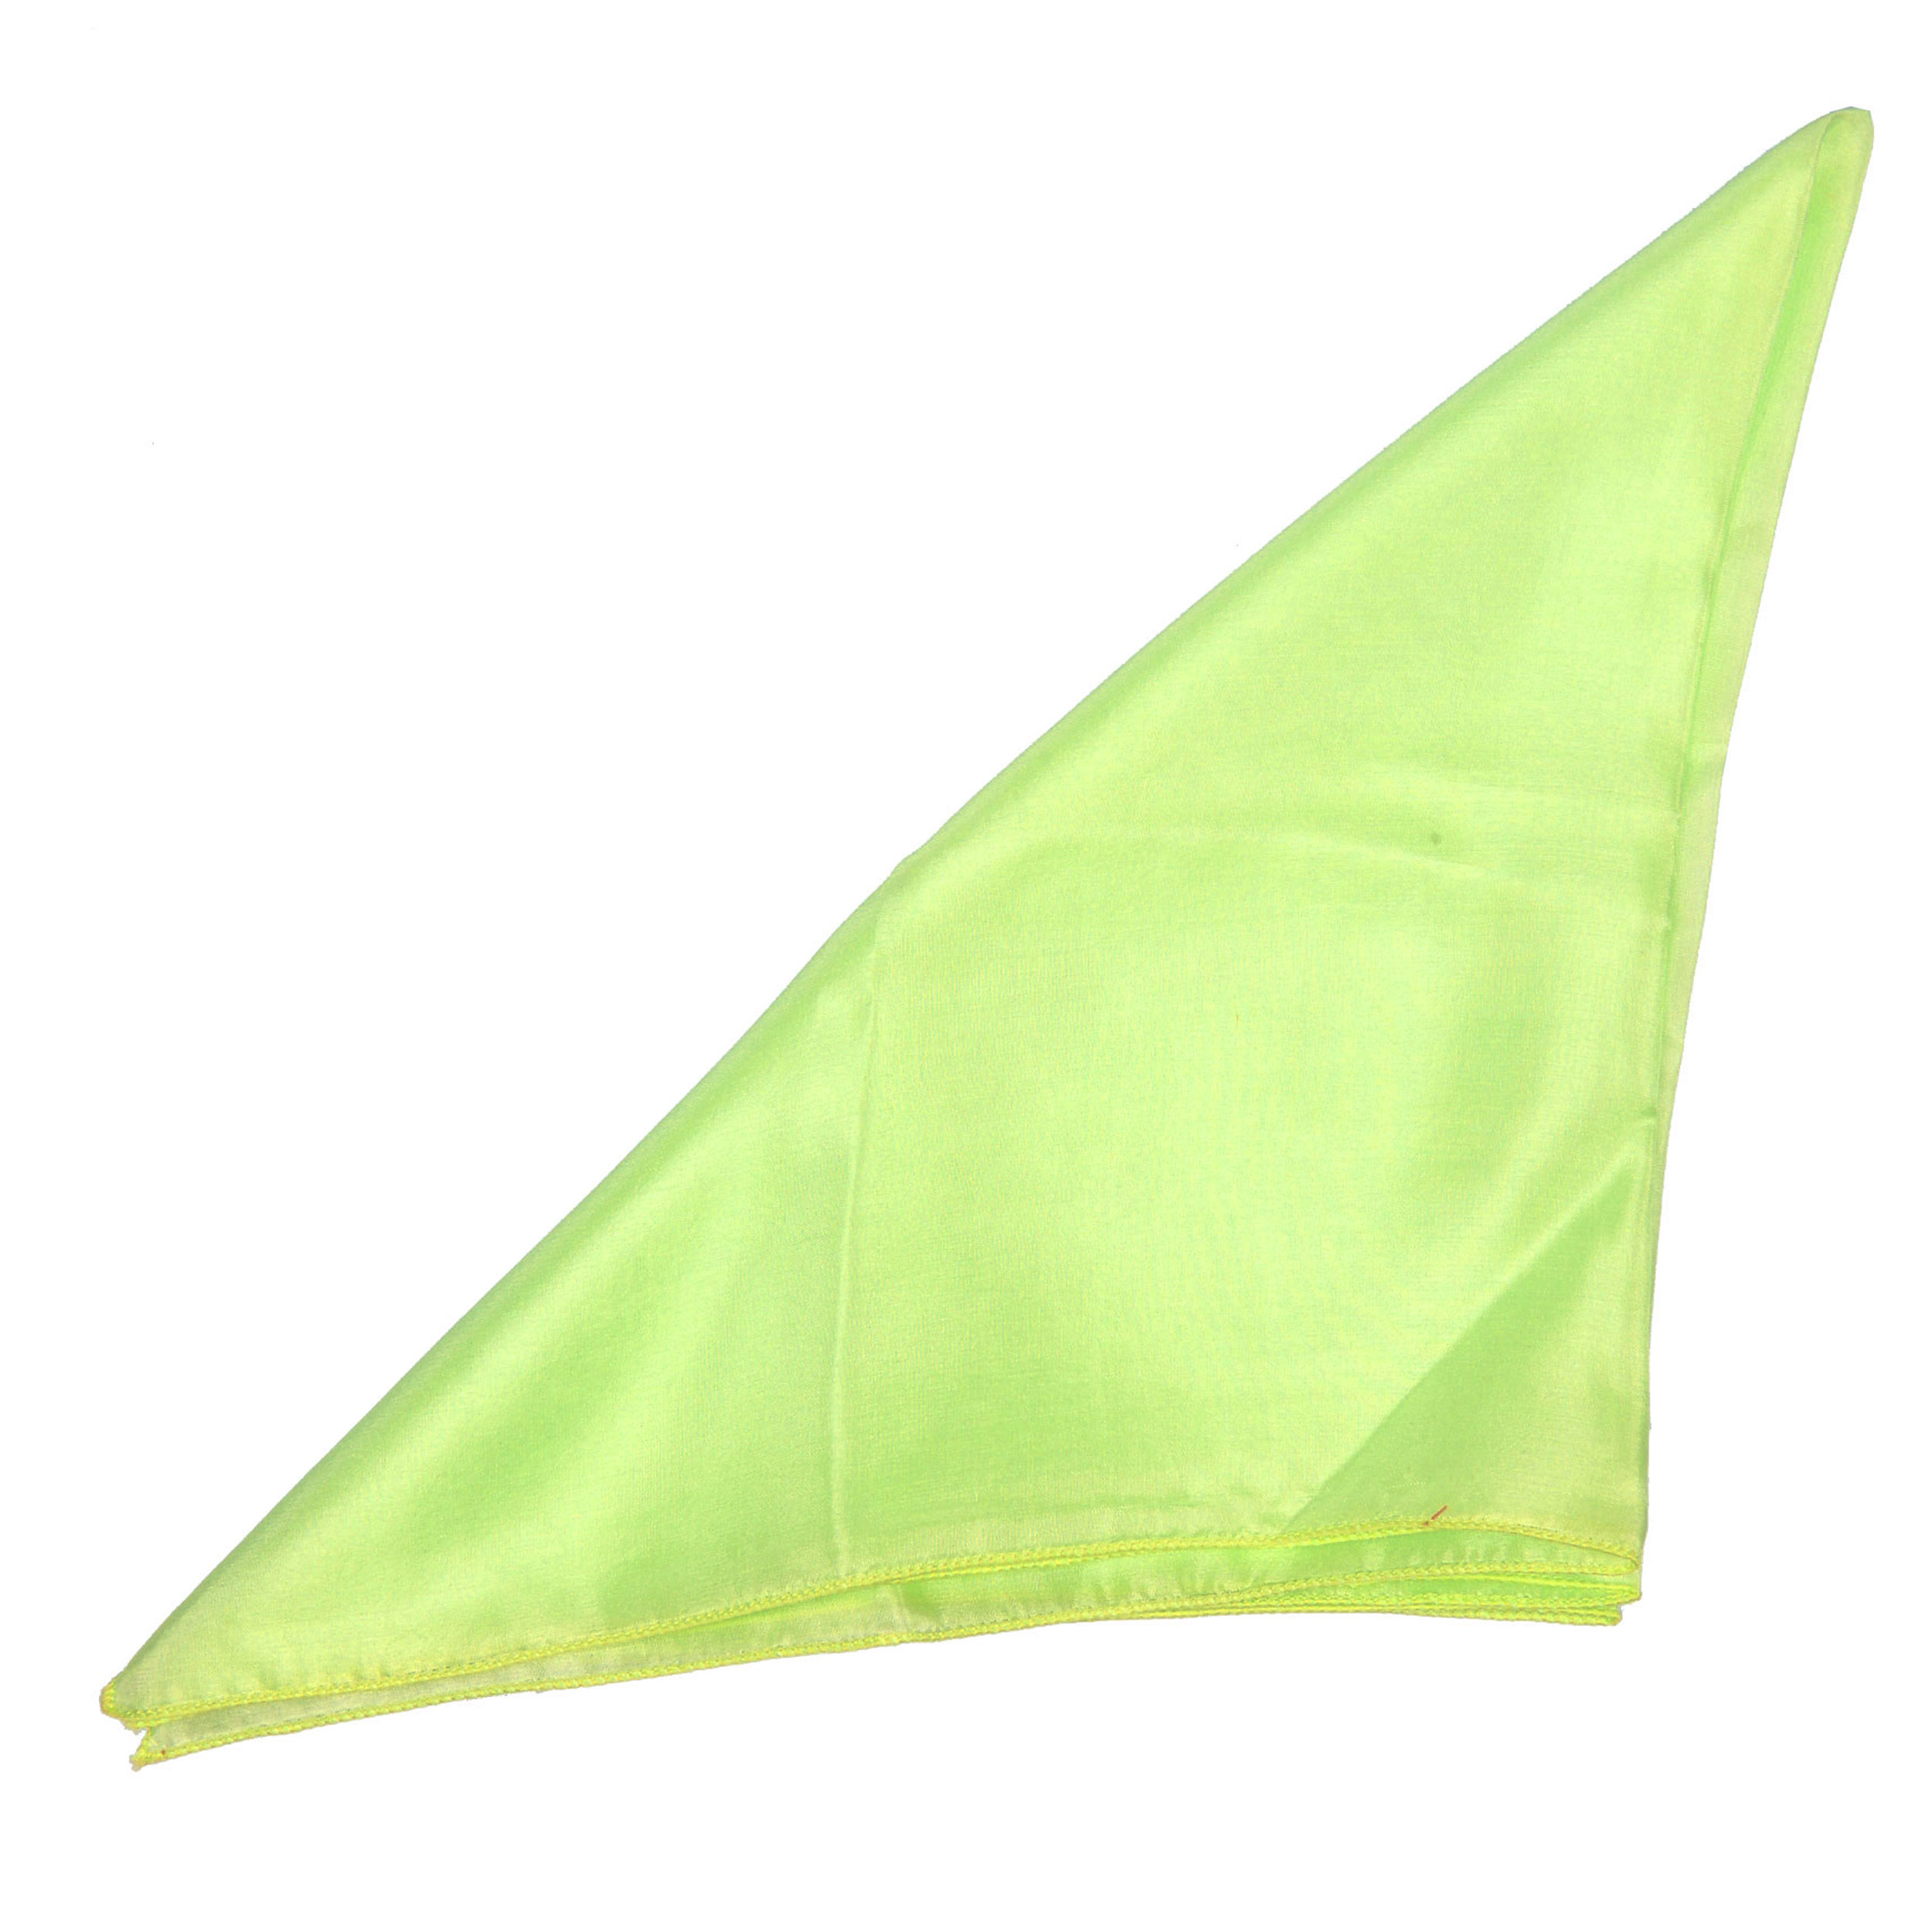 Pochette en soie vert anis pour costume